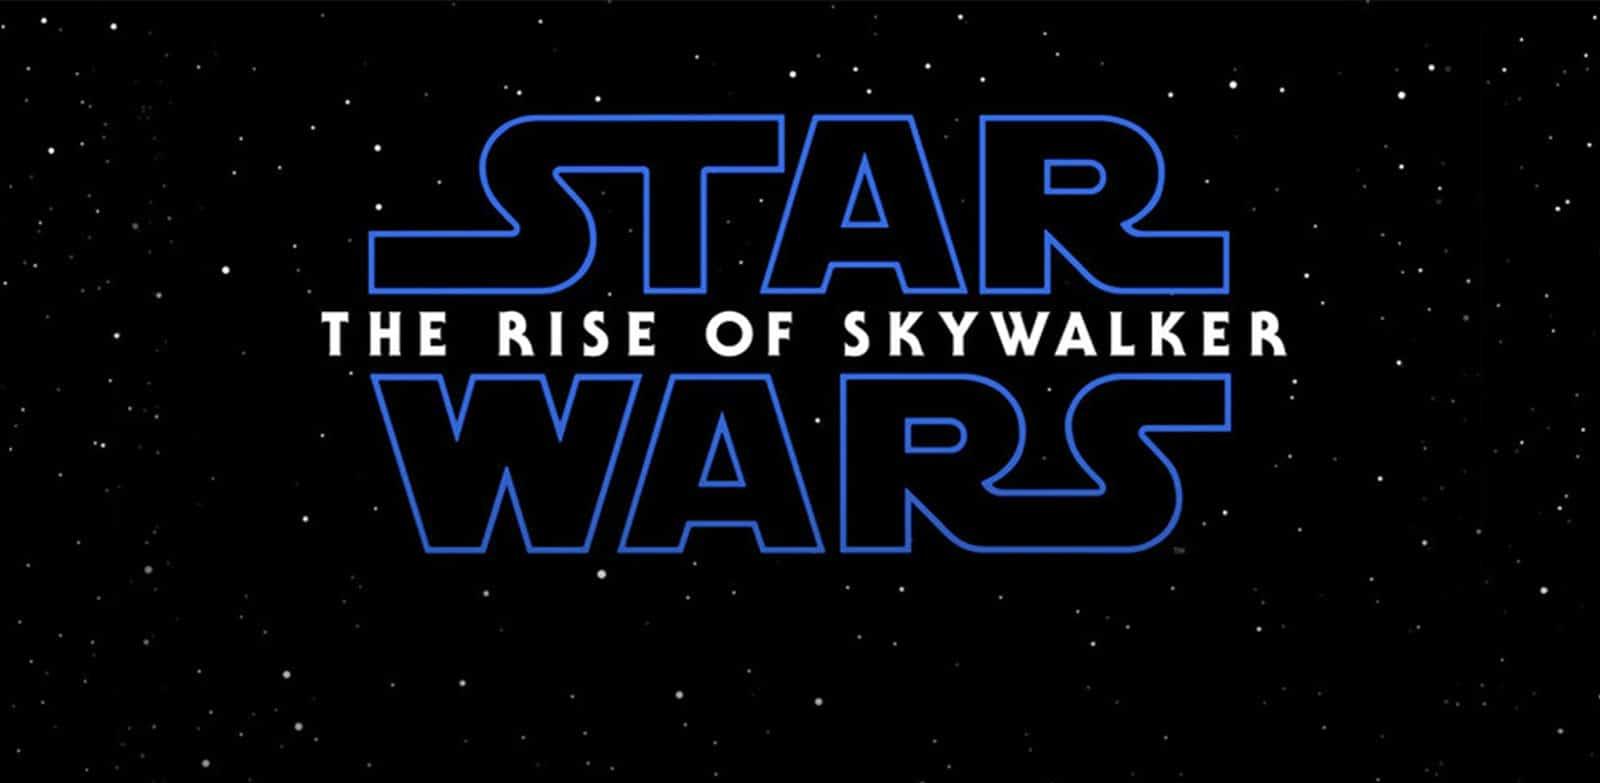 Star Wars Episode 9 coming December – Pickr - photo#10